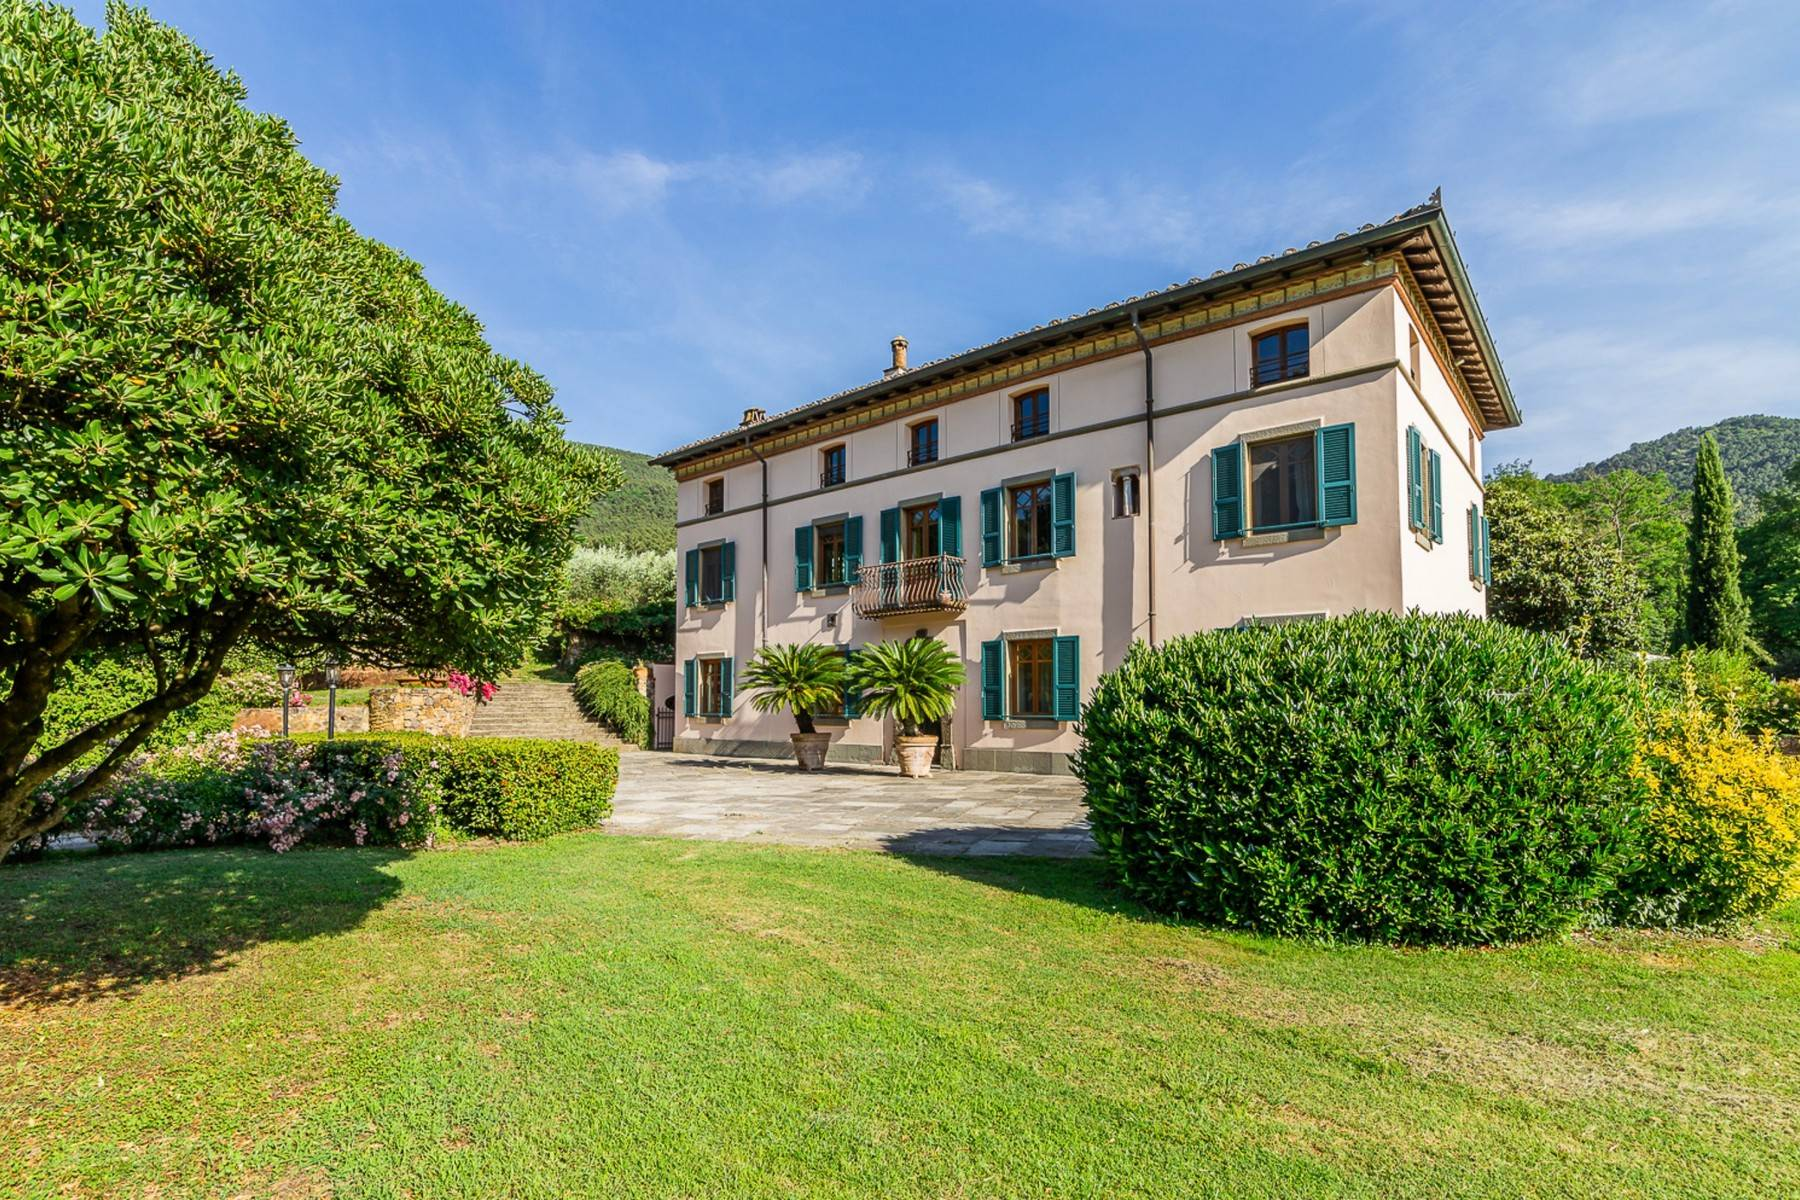 Villa in Vendita a Lucca: 5 locali, 1130 mq - Foto 5